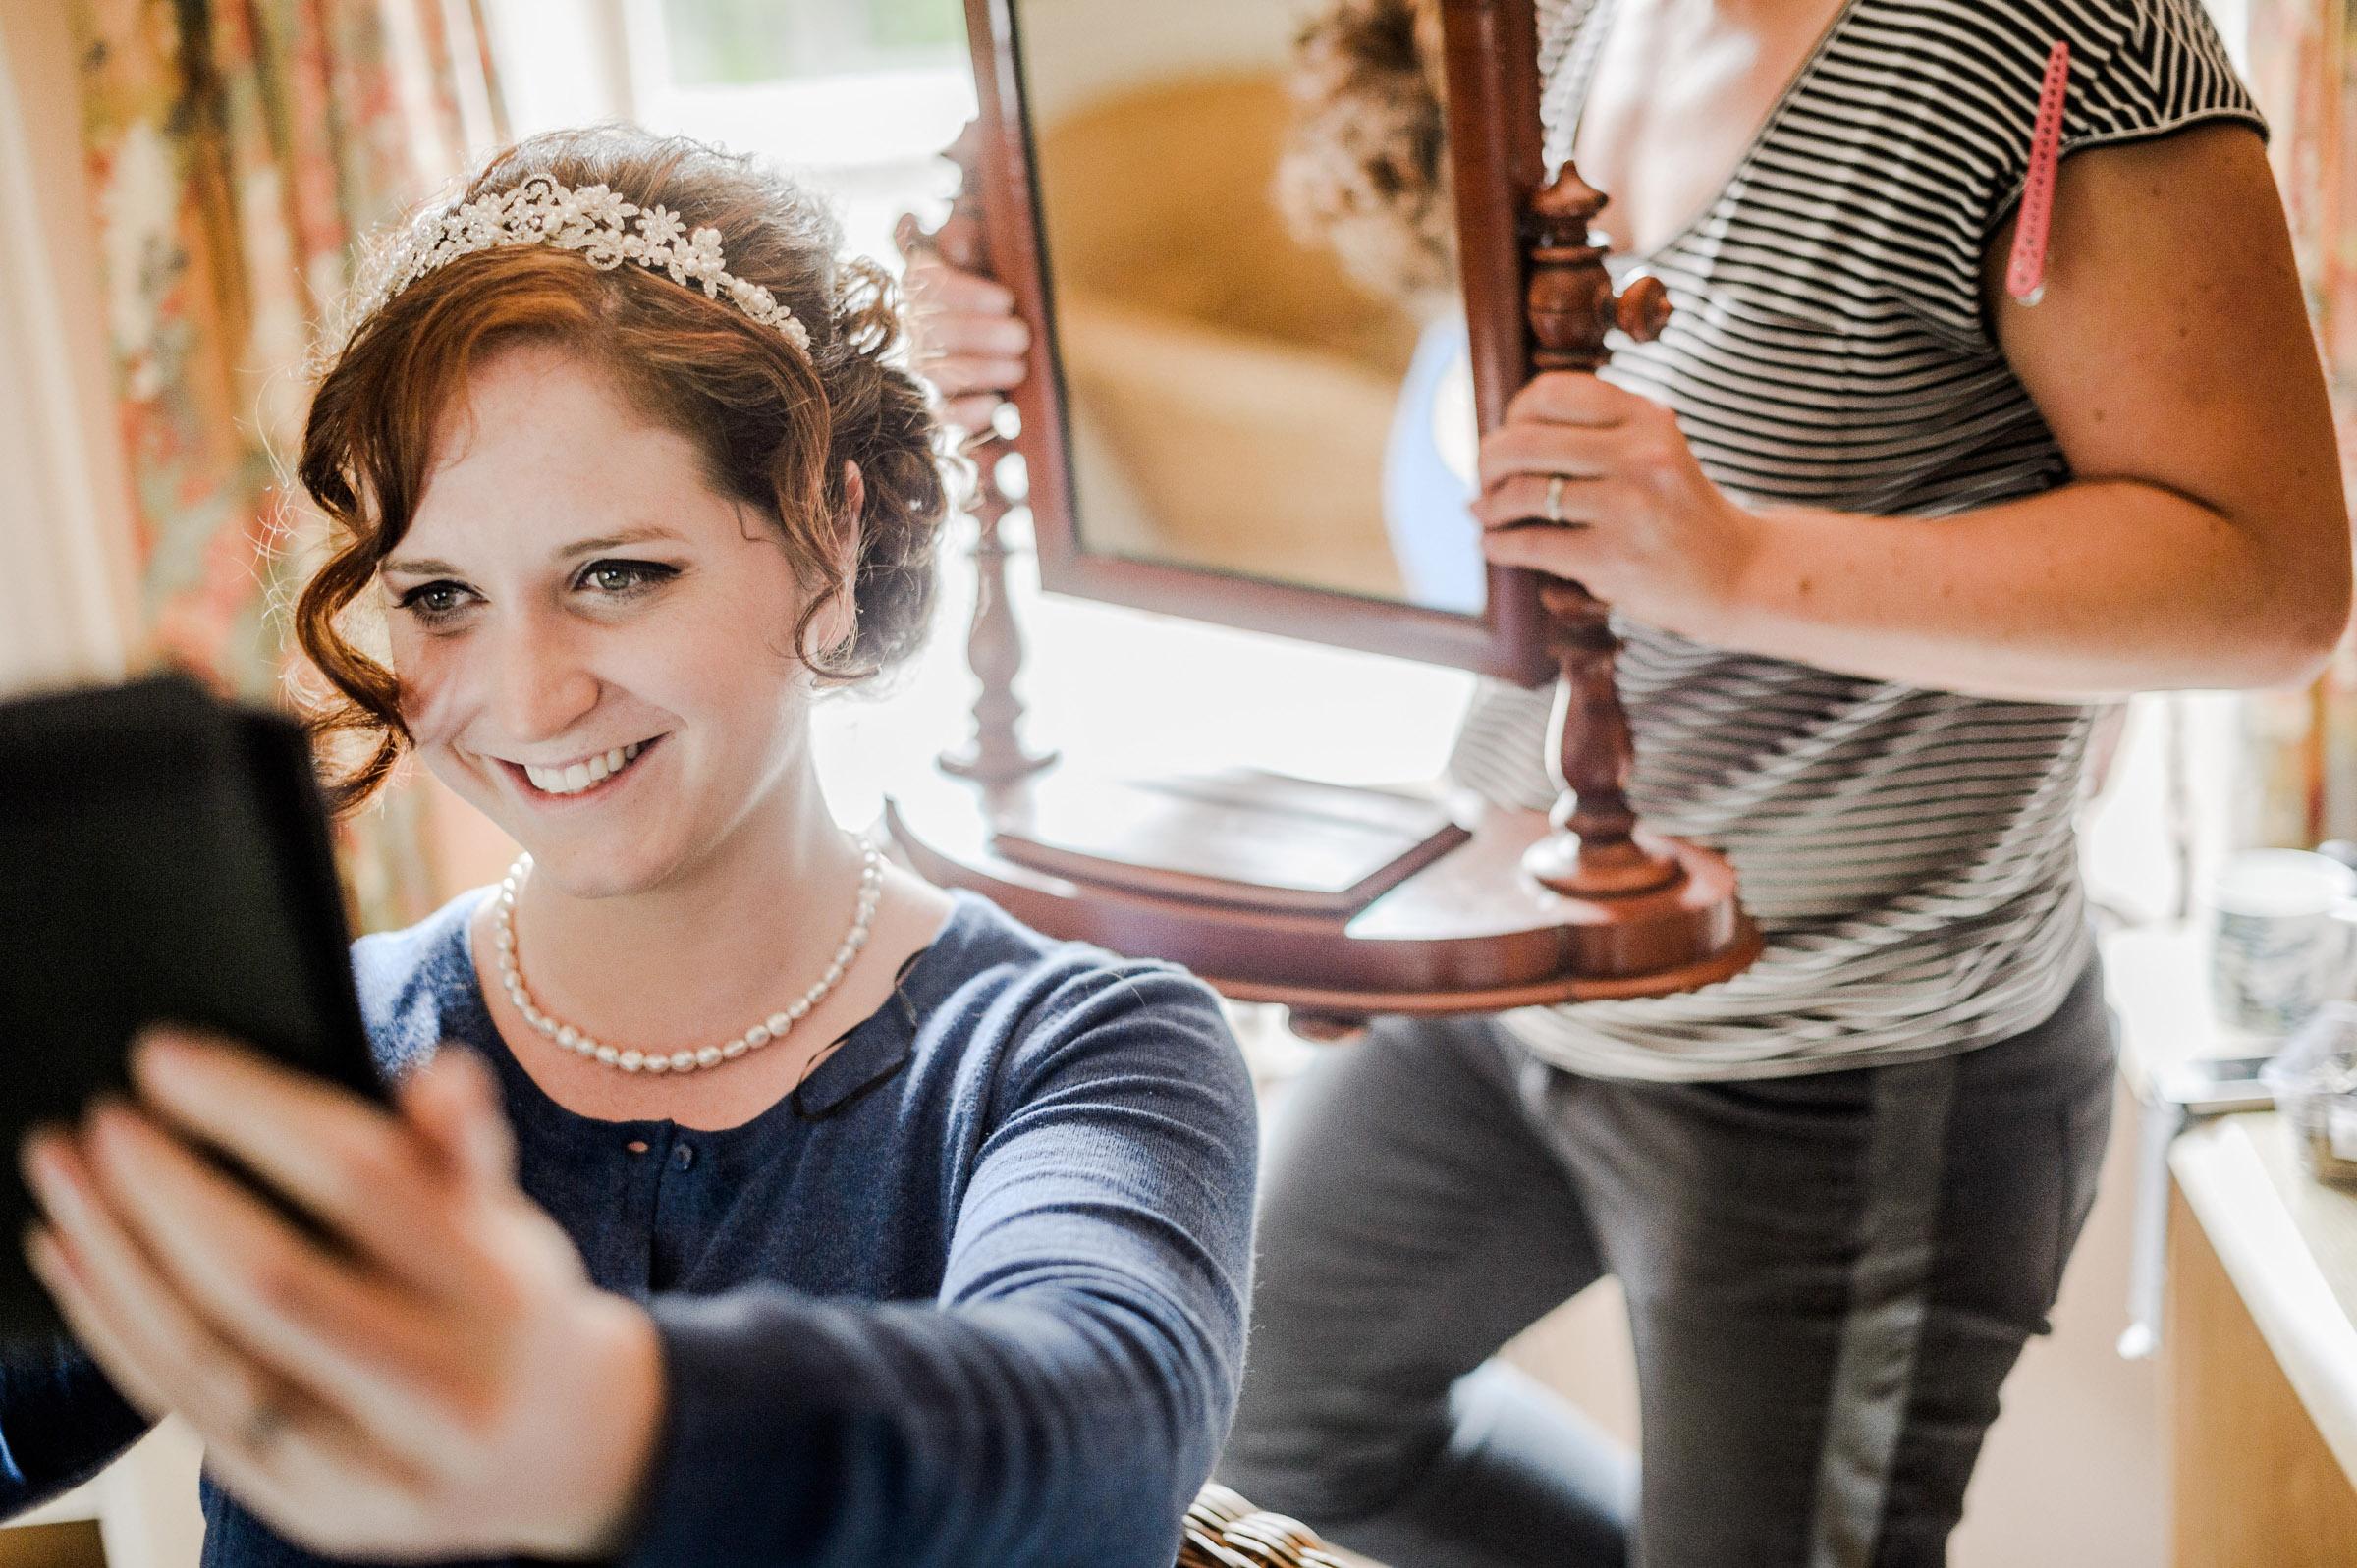 Ashmolean-Museum-Wedding-Pictures-0016.jpg